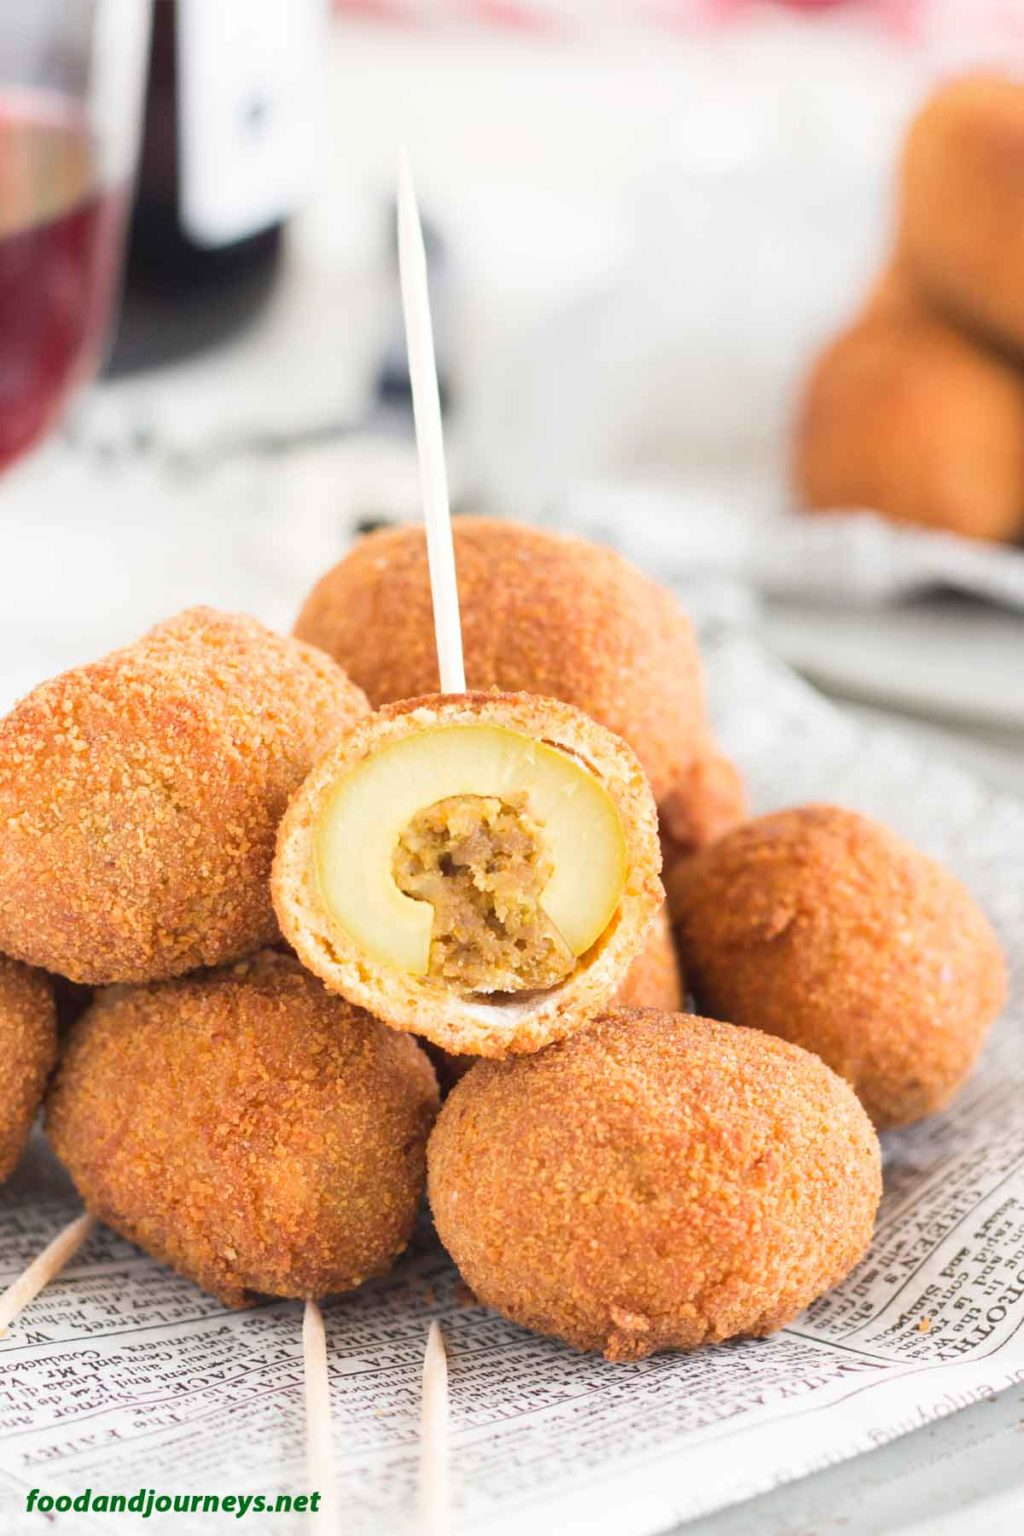 Fried Stuffed Olives PIC1|foodandjourneys.net